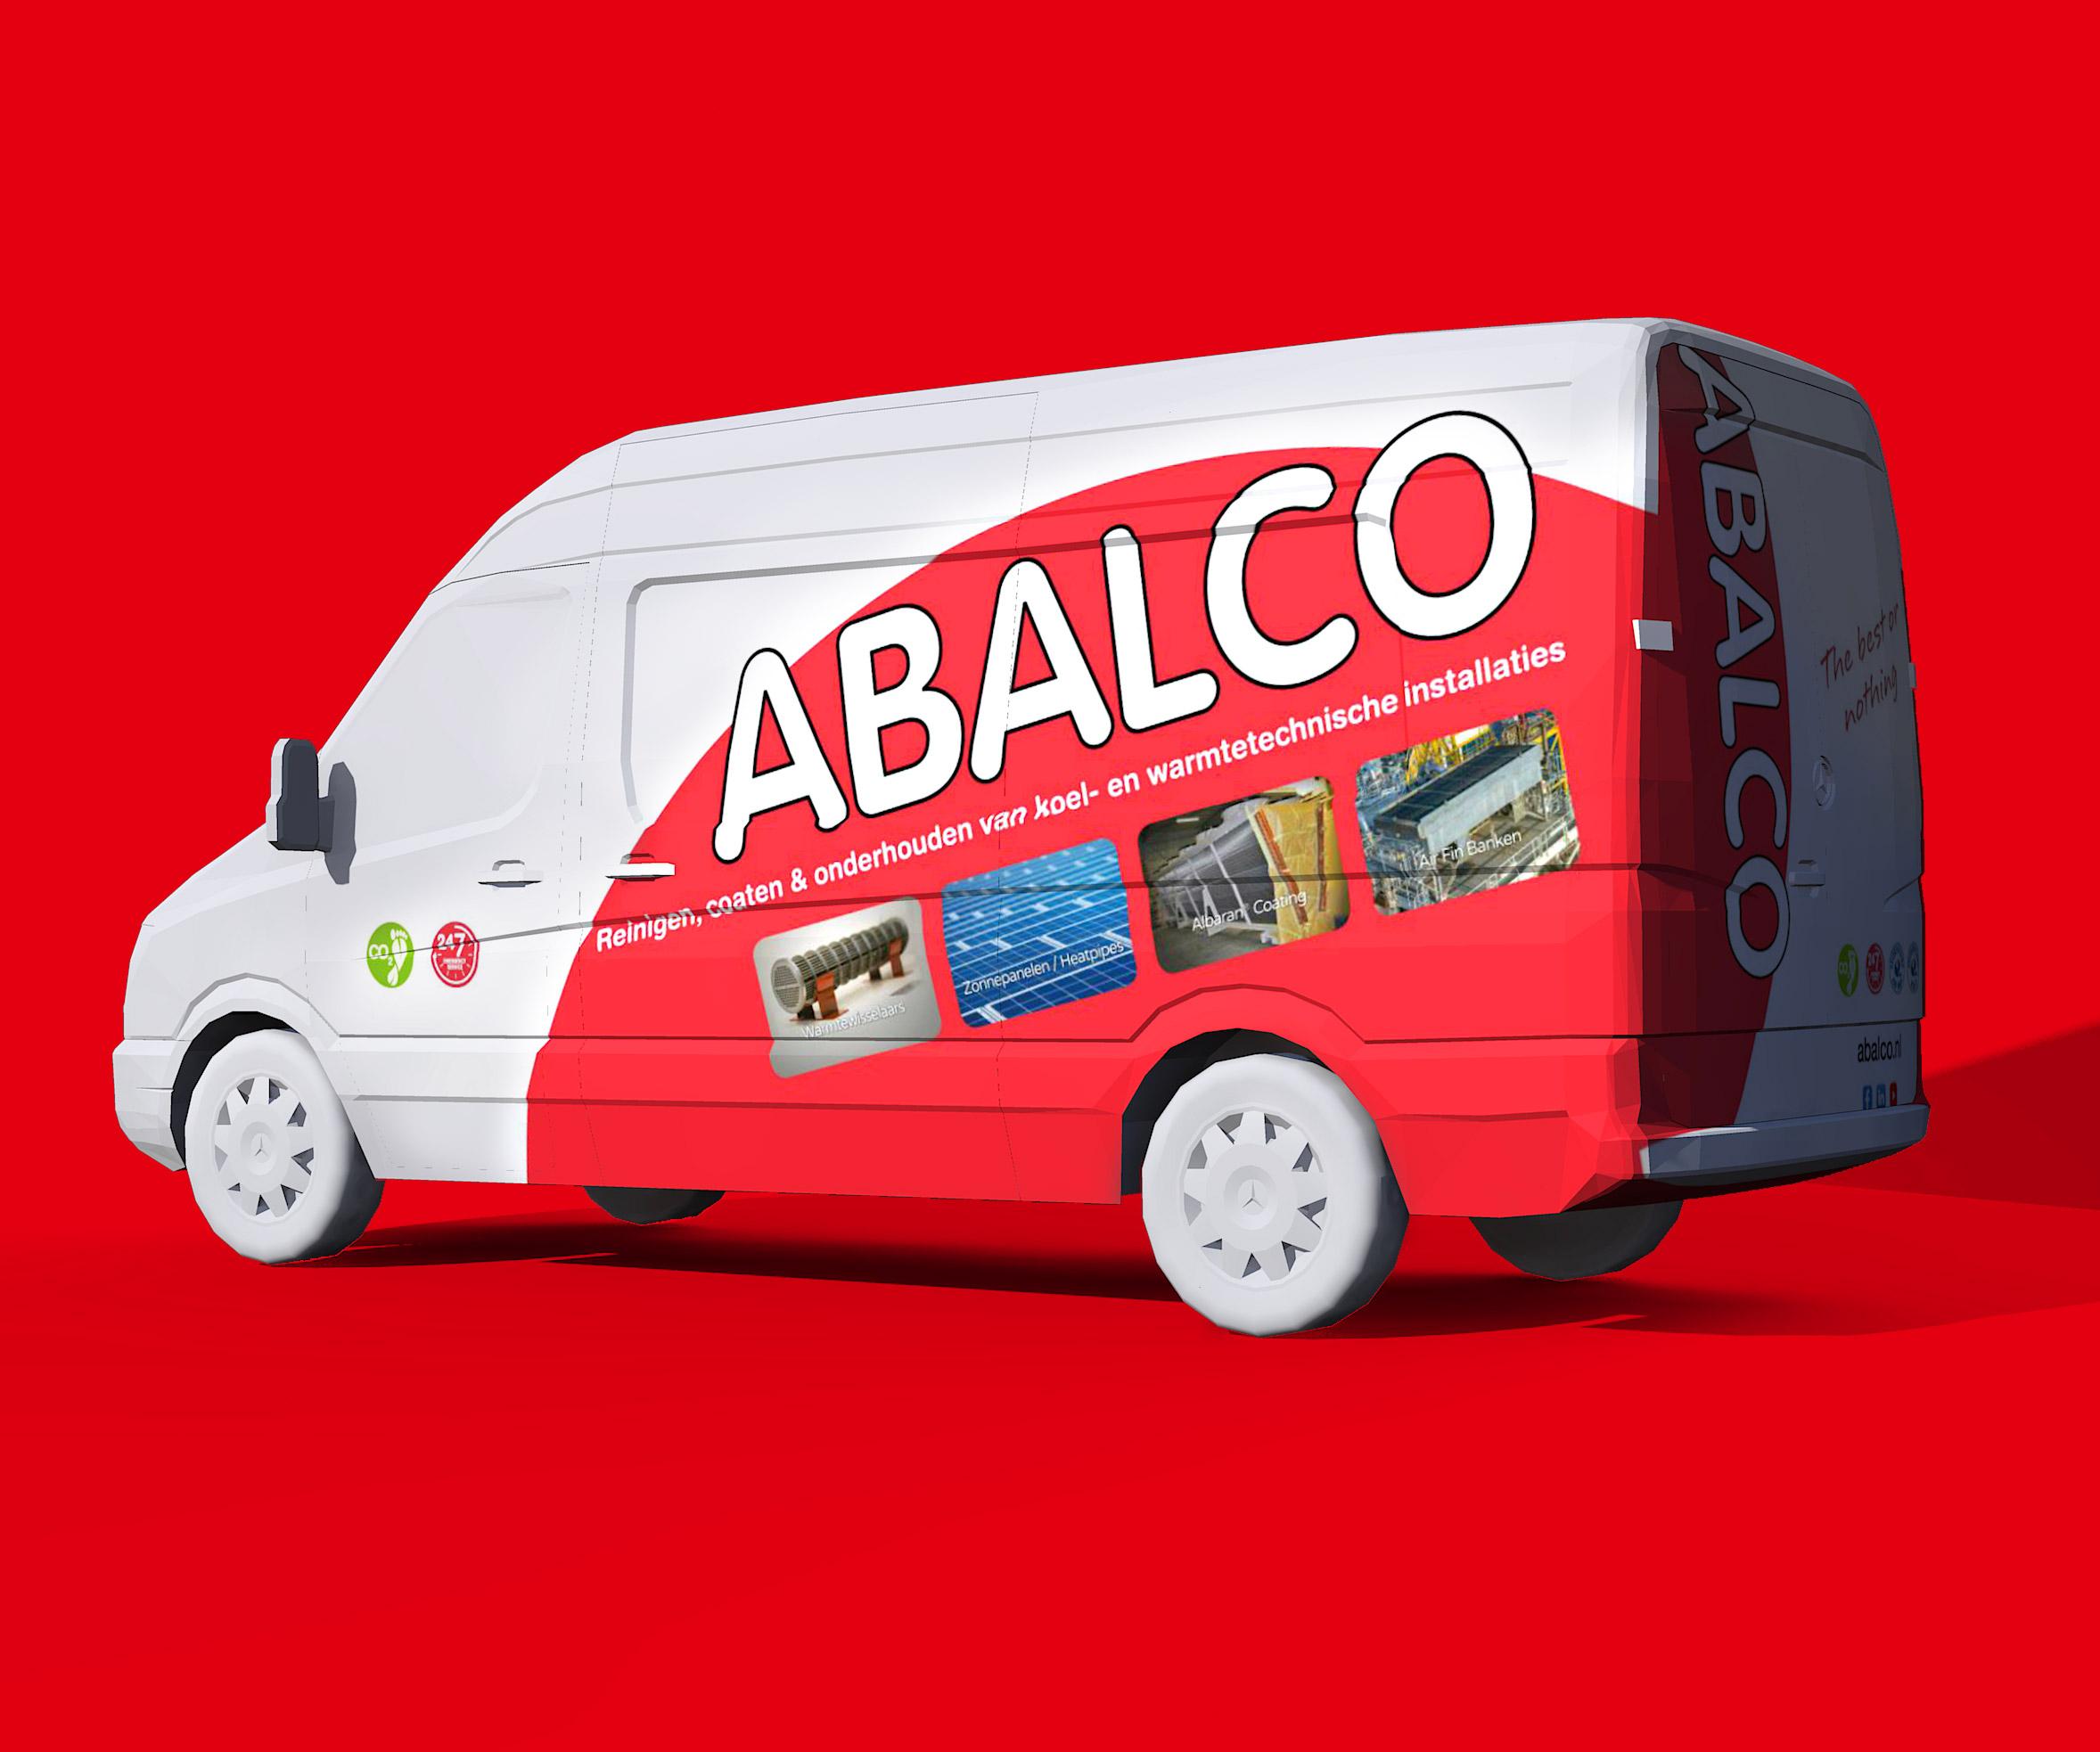 Abalco bestickering bus